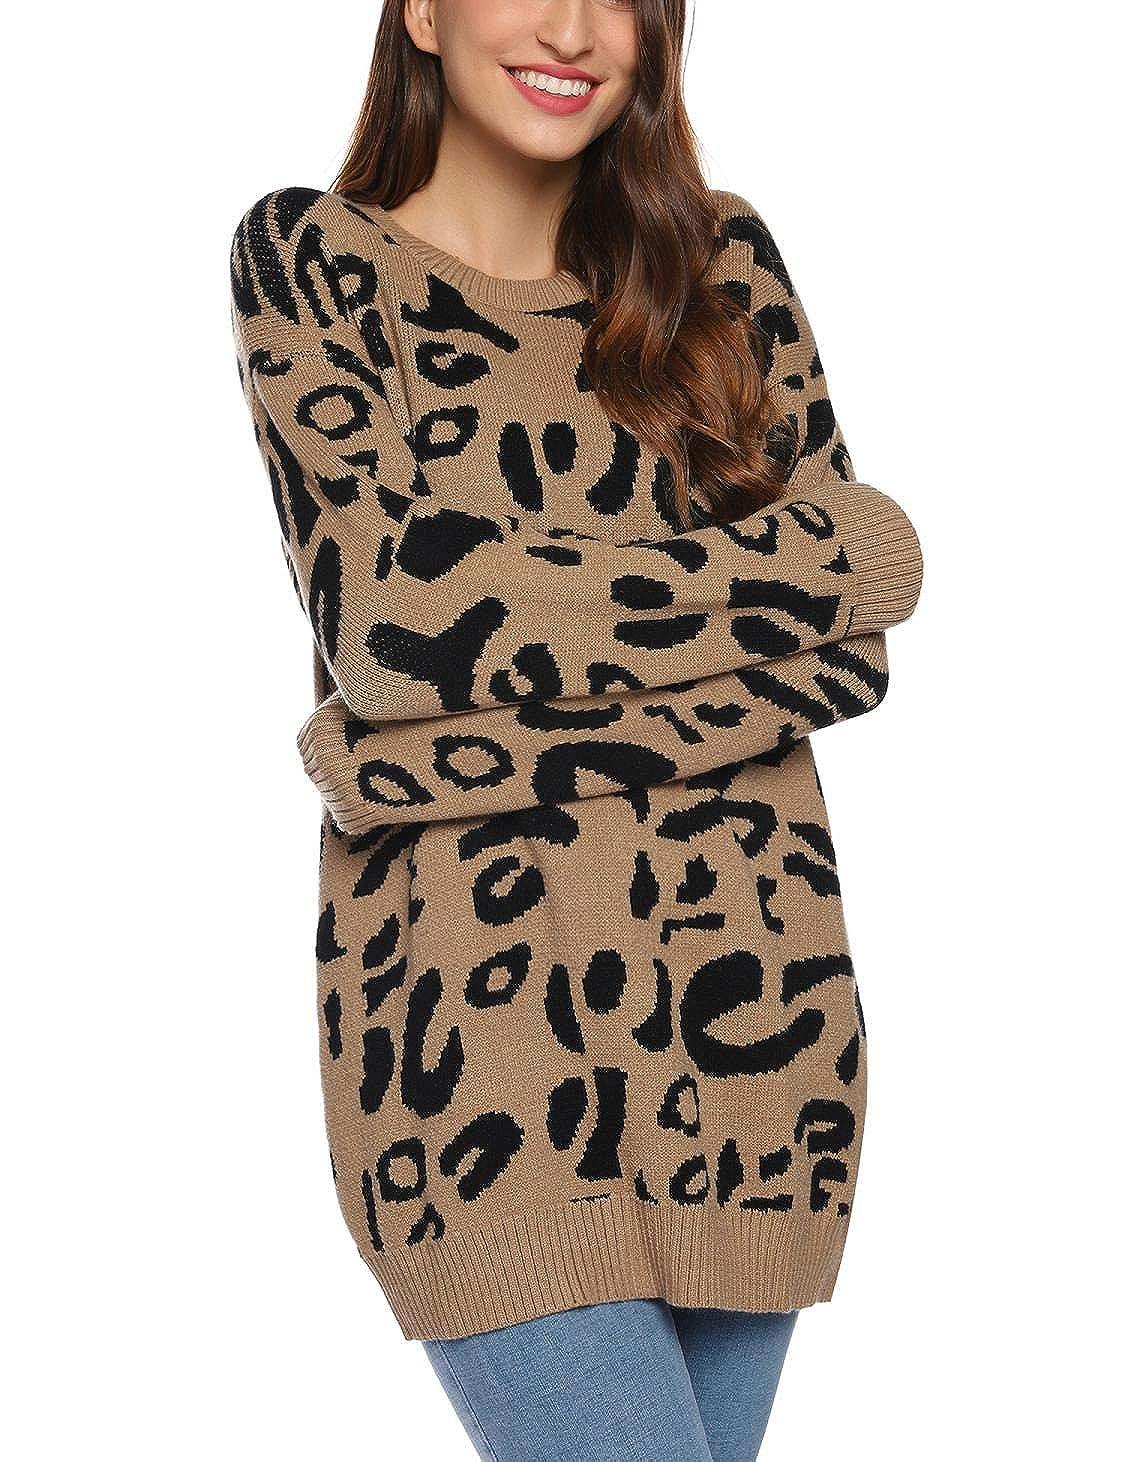 Akalnny Jersey Mujer Cuello Redondo Manga Larga Su/éteres de Leopardo de Moda Oversize Prendas de Punto para Oto/ño Invierno